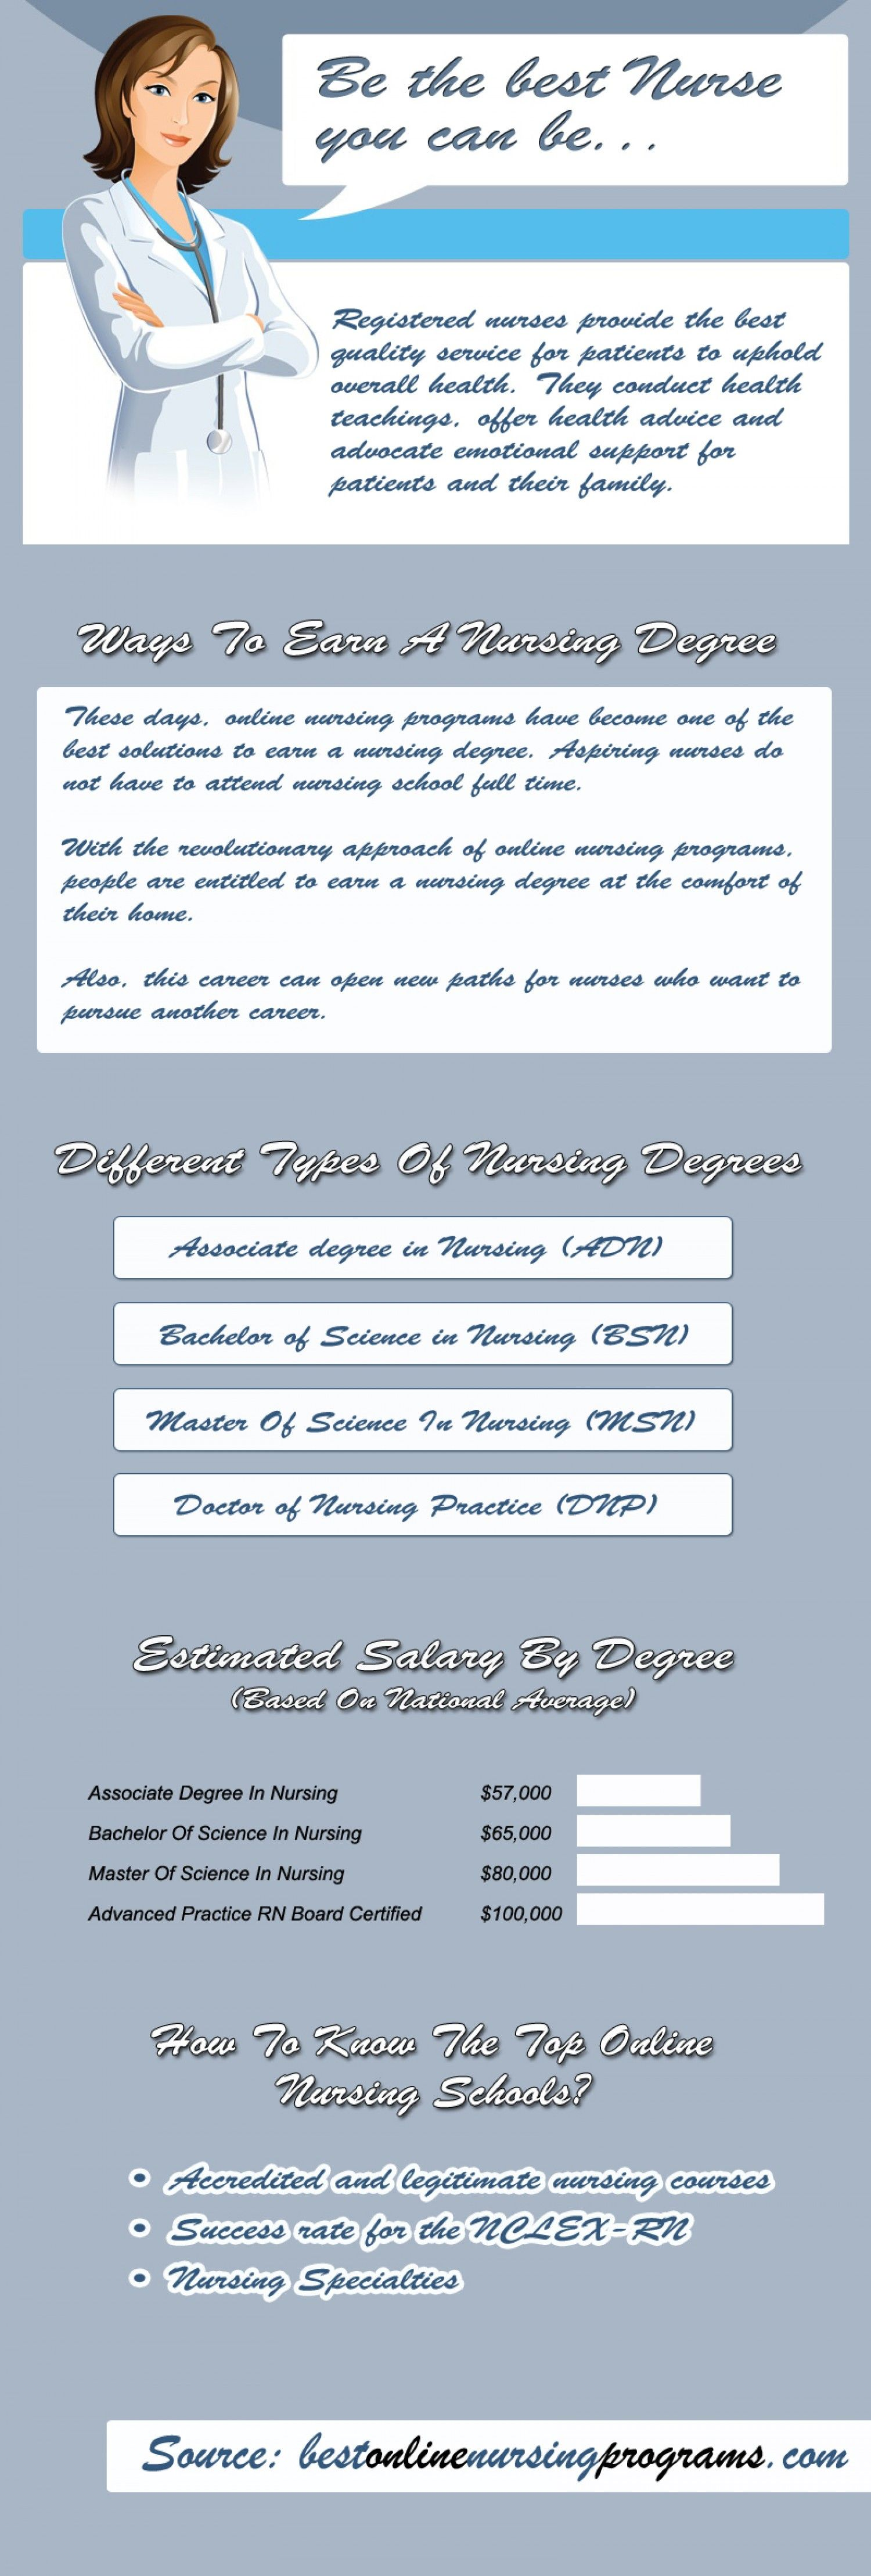 Different Types Of Nursing Degrees Infographic L D Pediatric